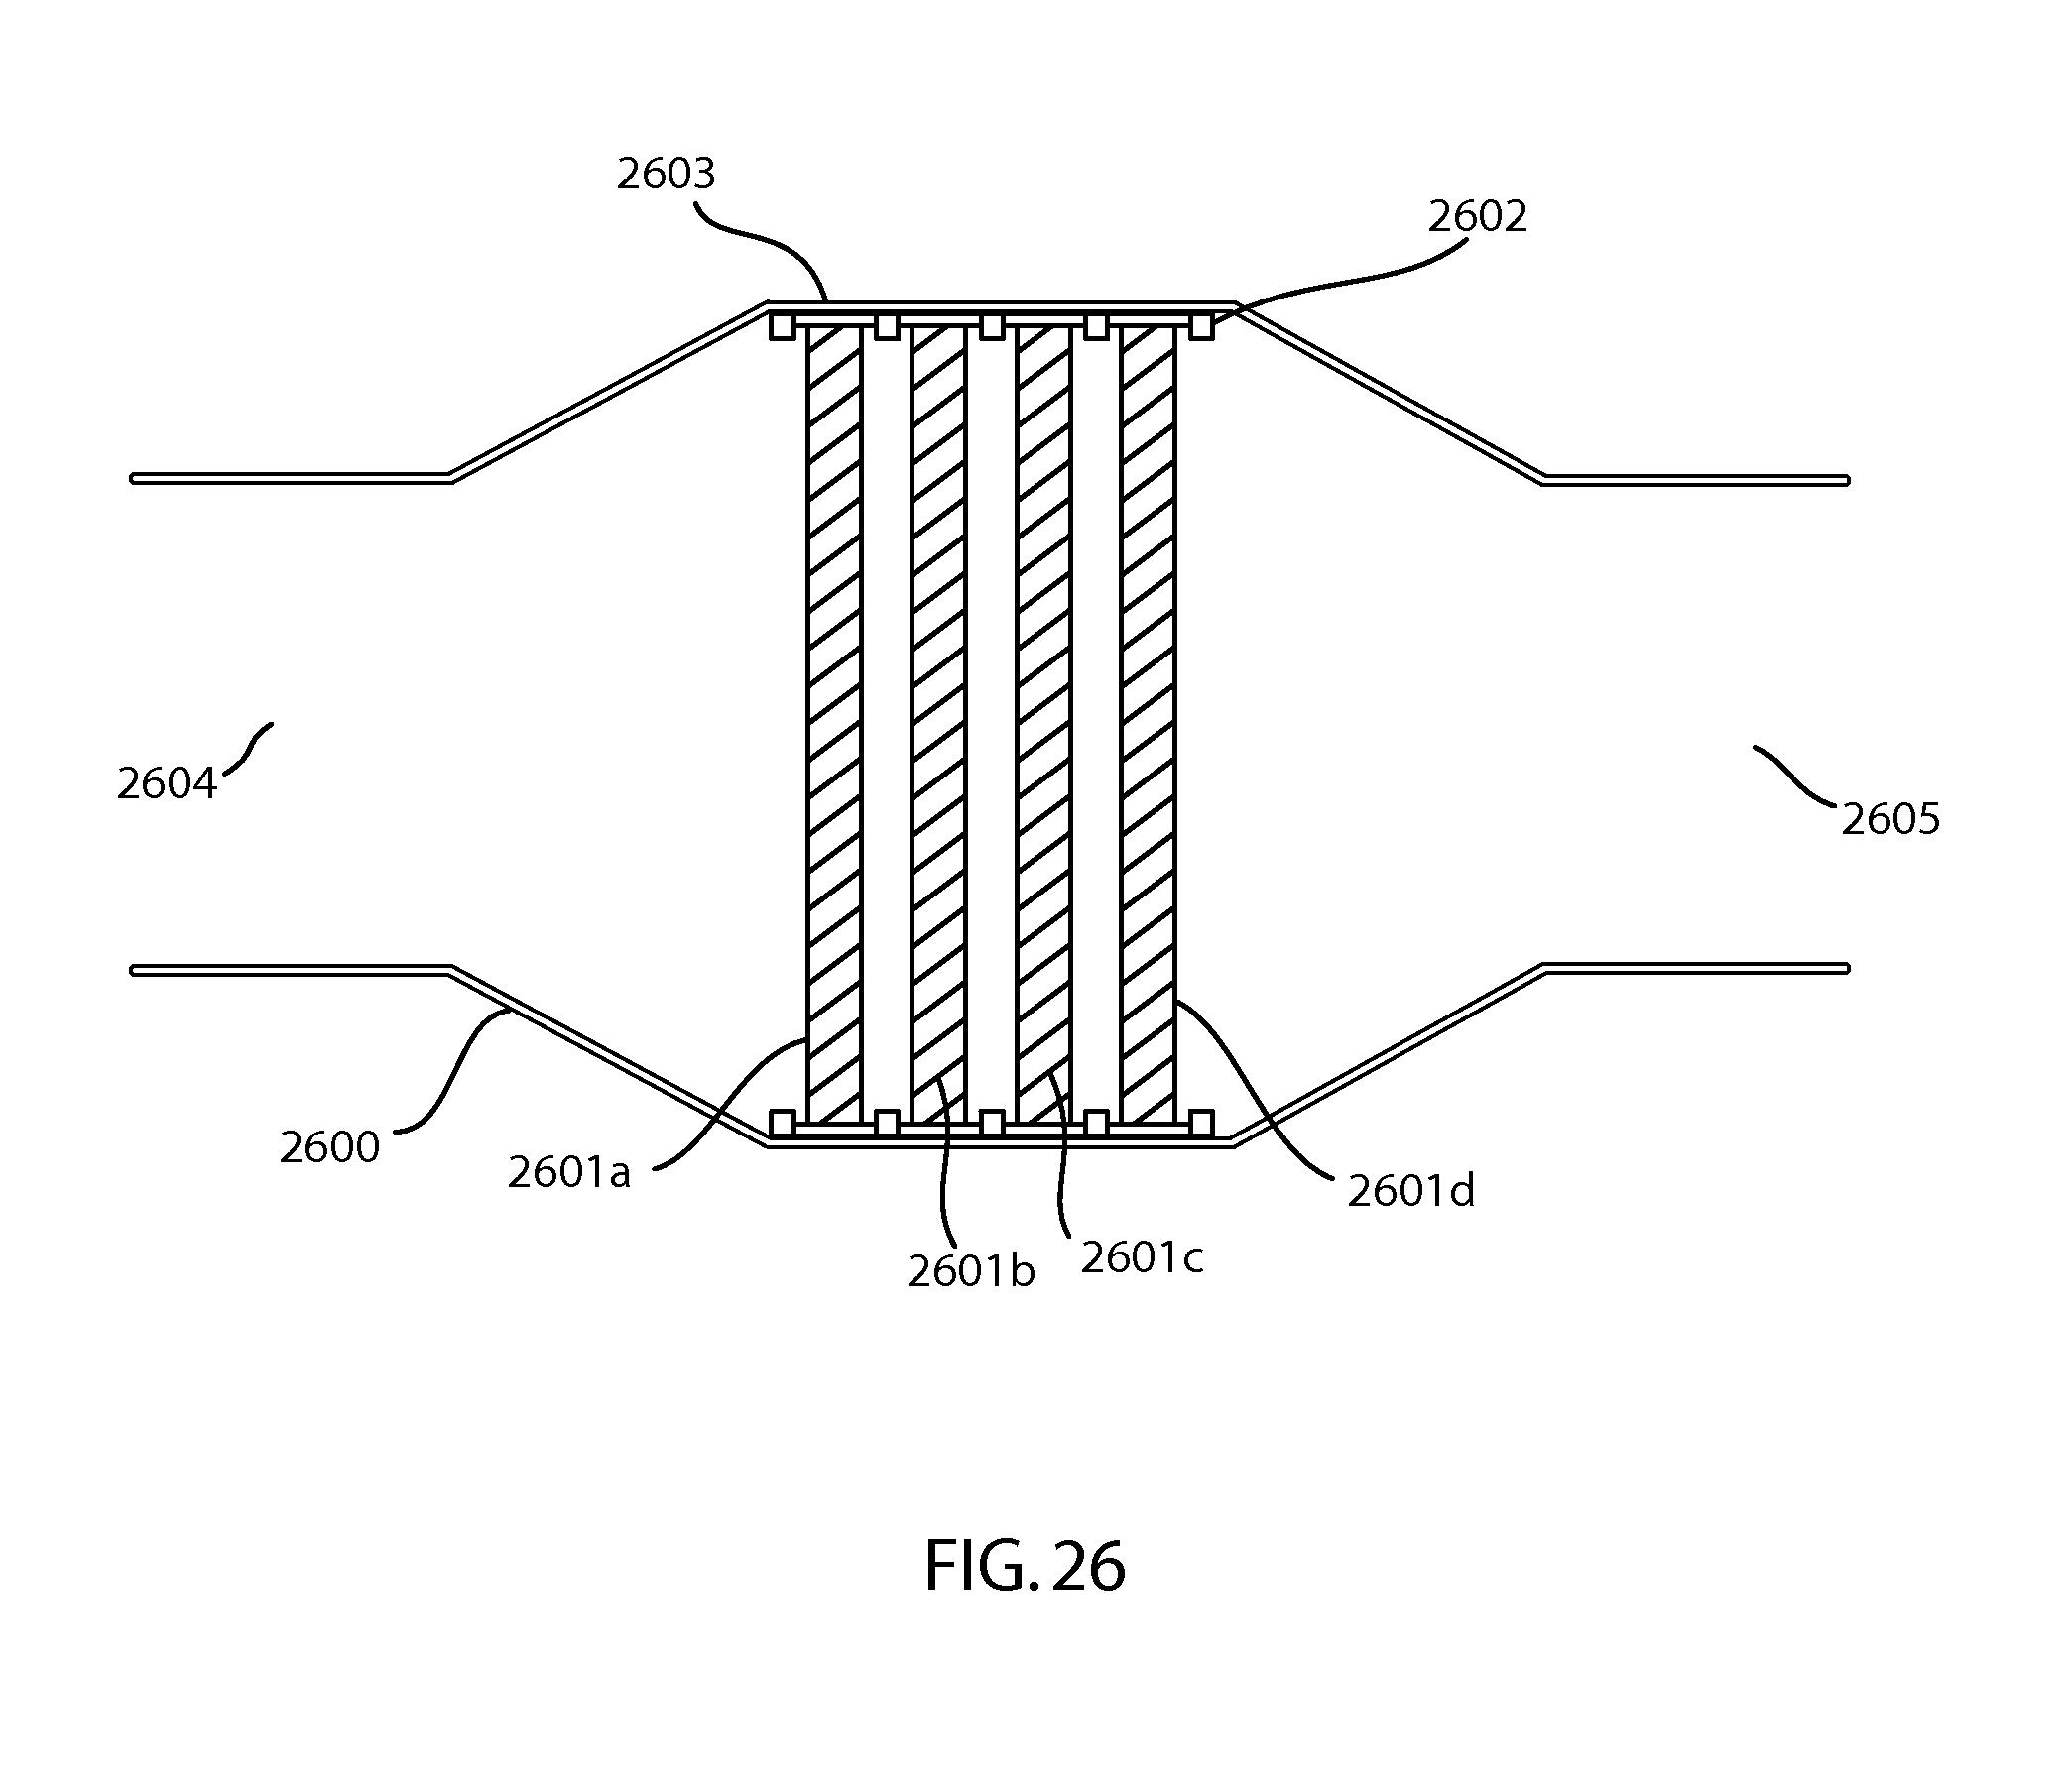 k n revised best air conditioning wiring diagram tape